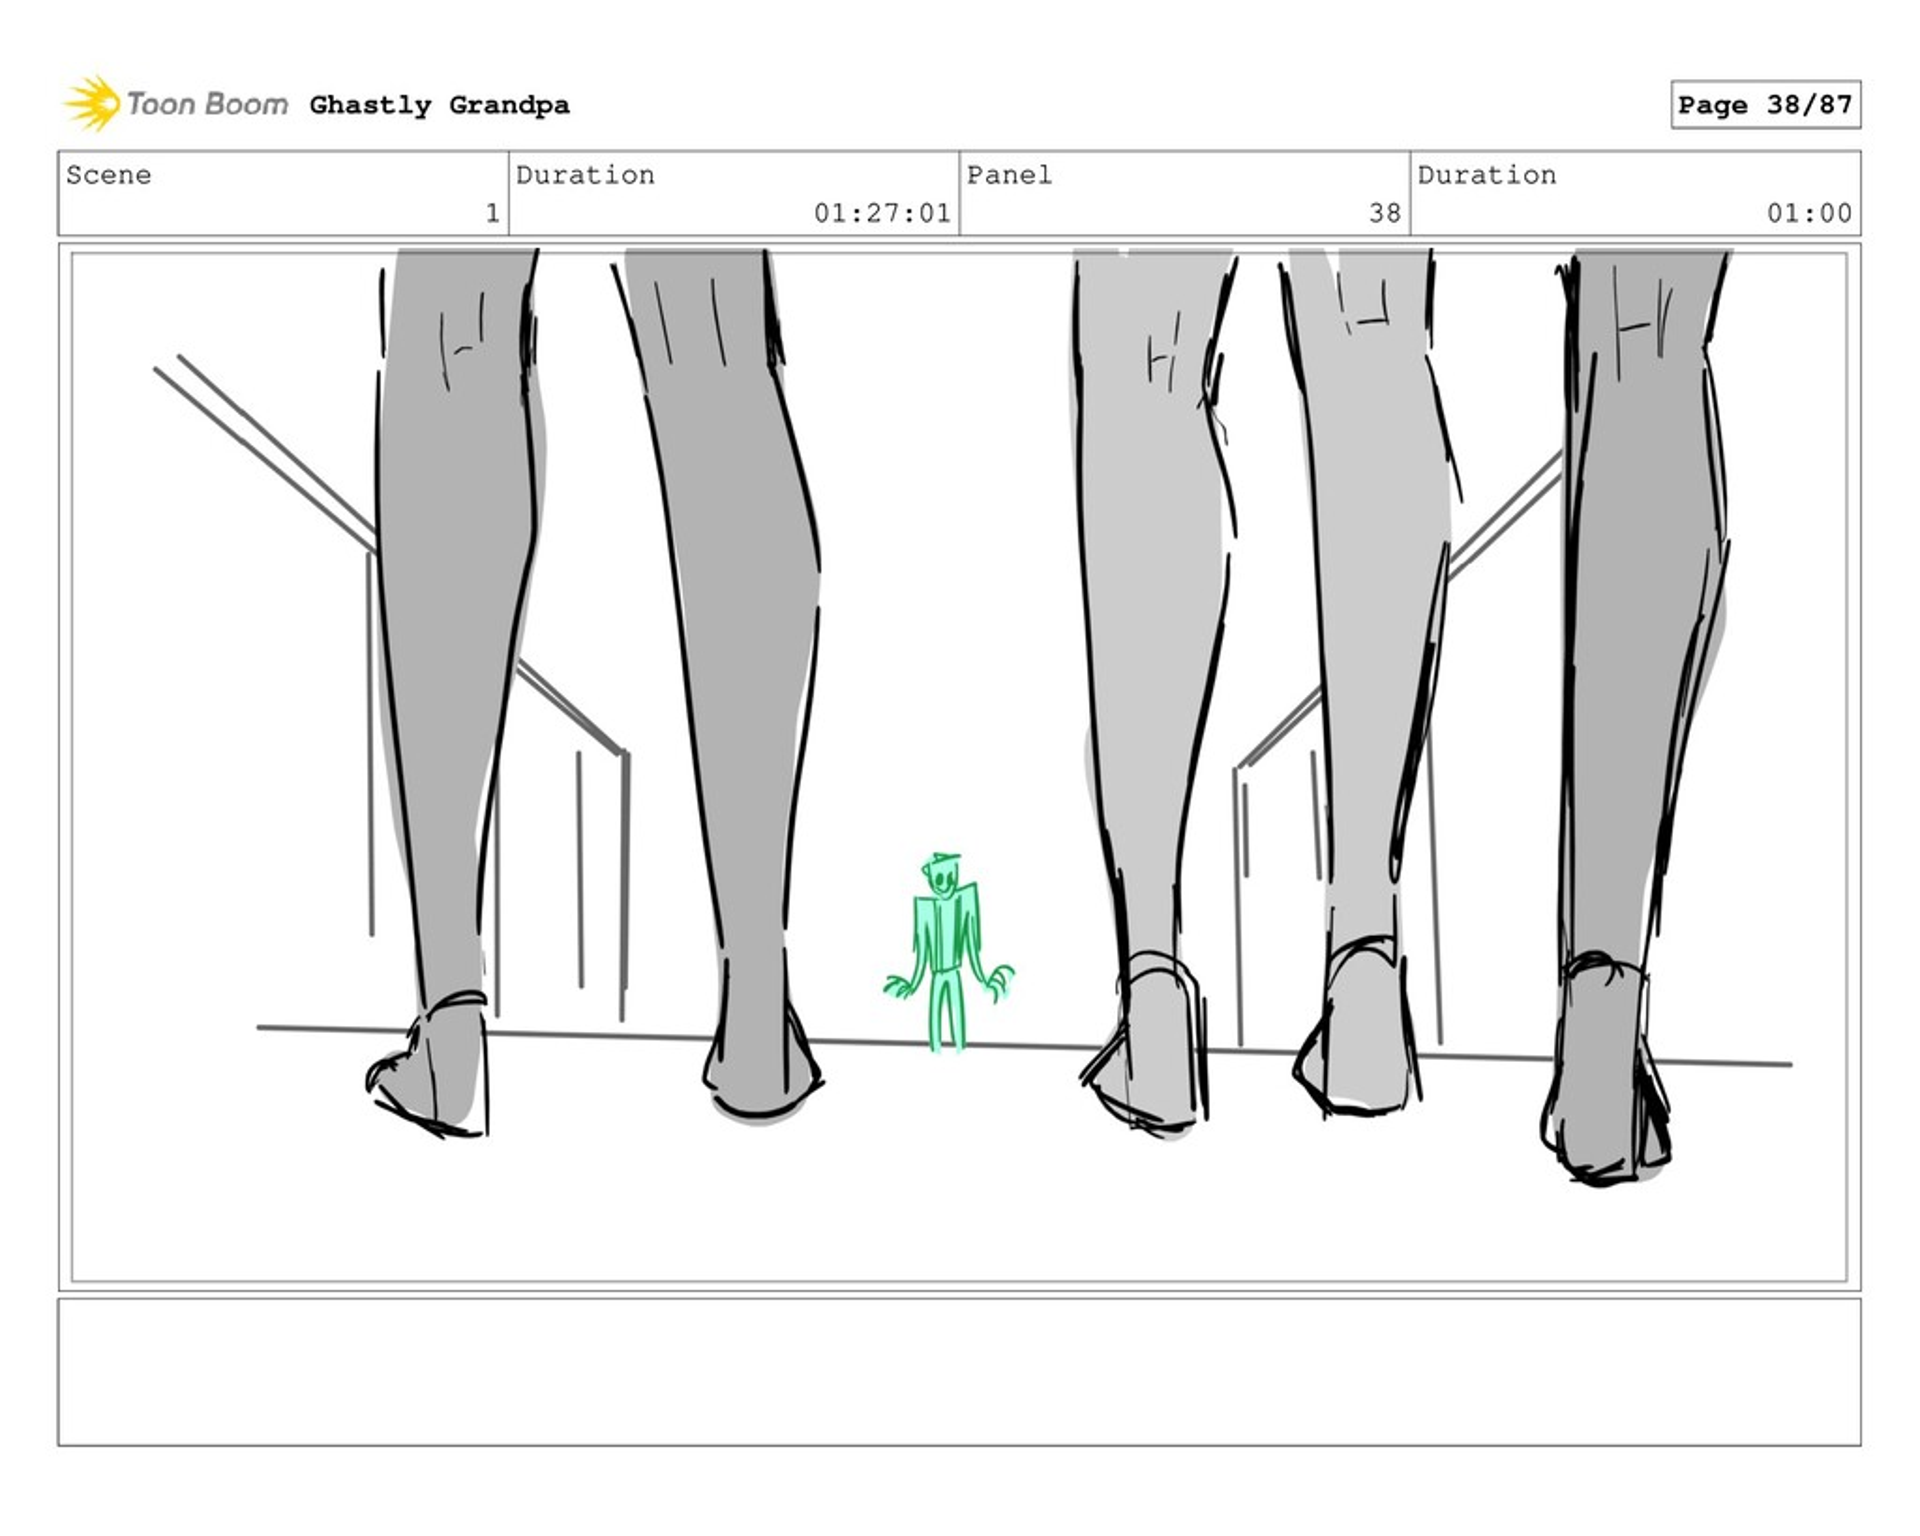 Scene 1 Duration 01:27:01 Panel 38 Duration 01:...